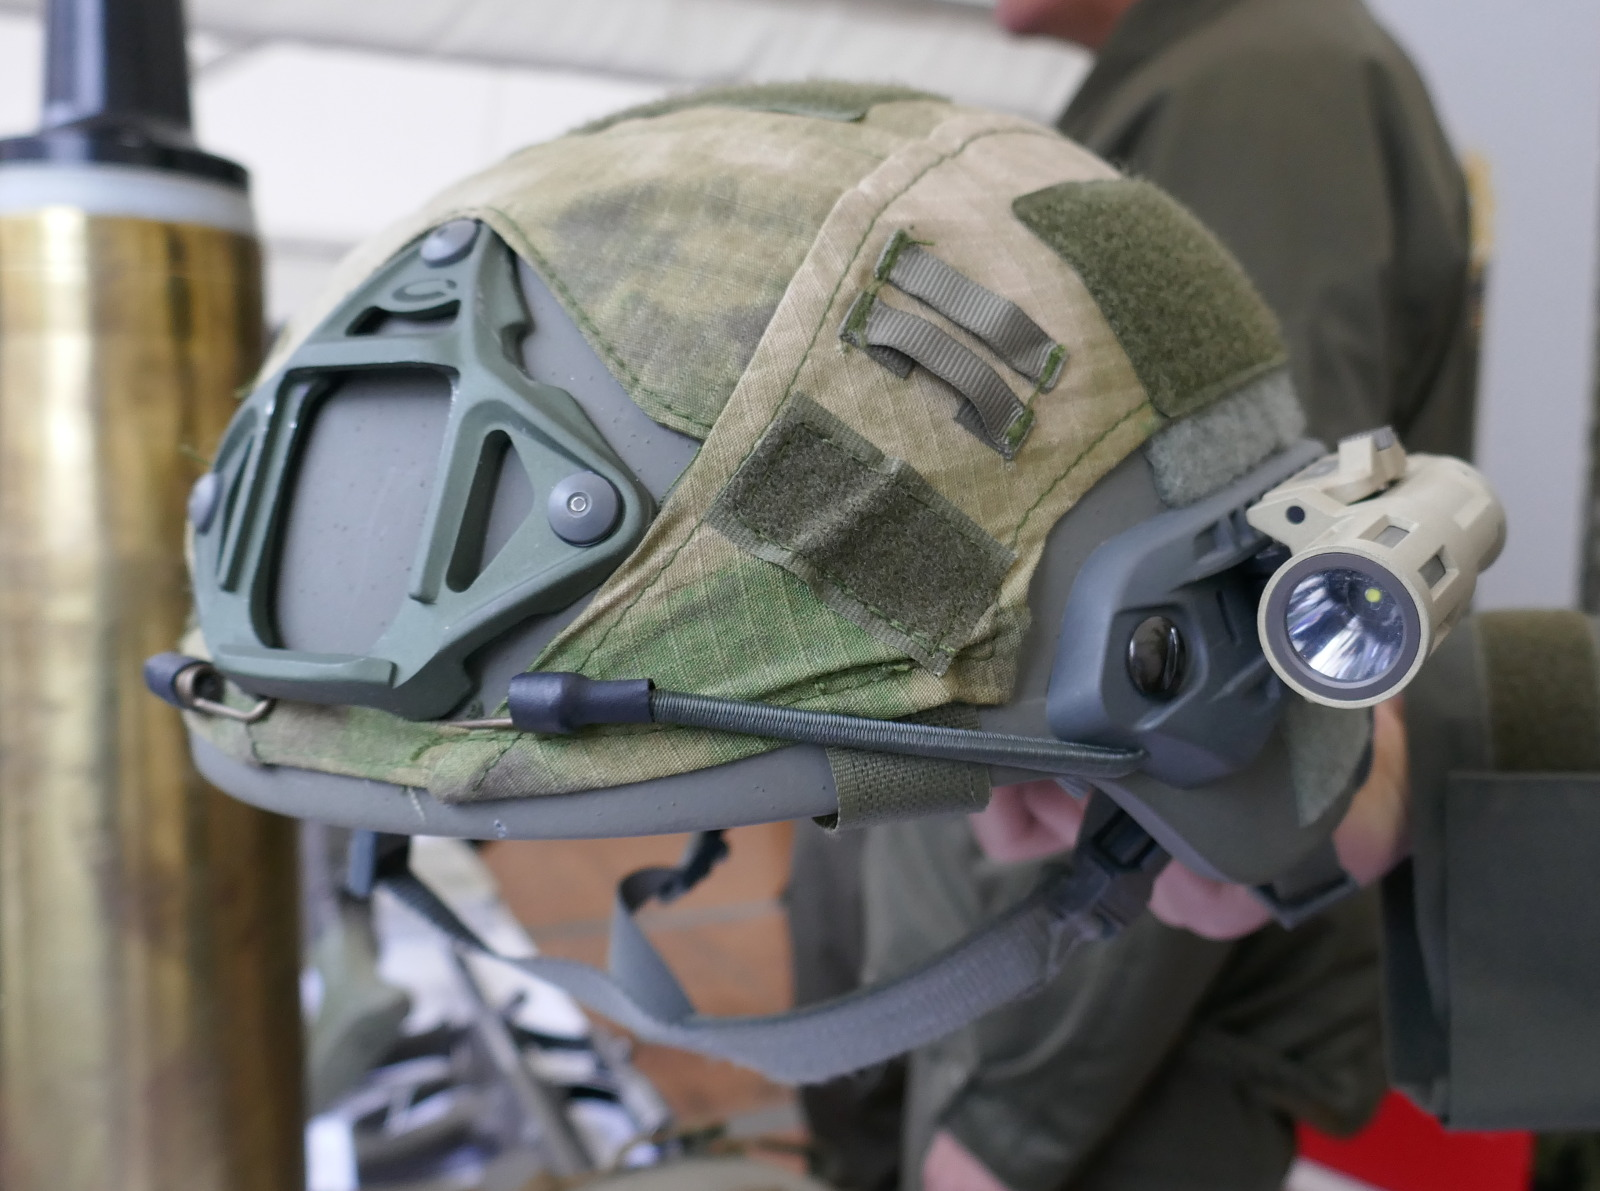 Neuer Helm: Sentry XP Mid Cut Helmet von Ops-Core Inc. © Doppeladler.com